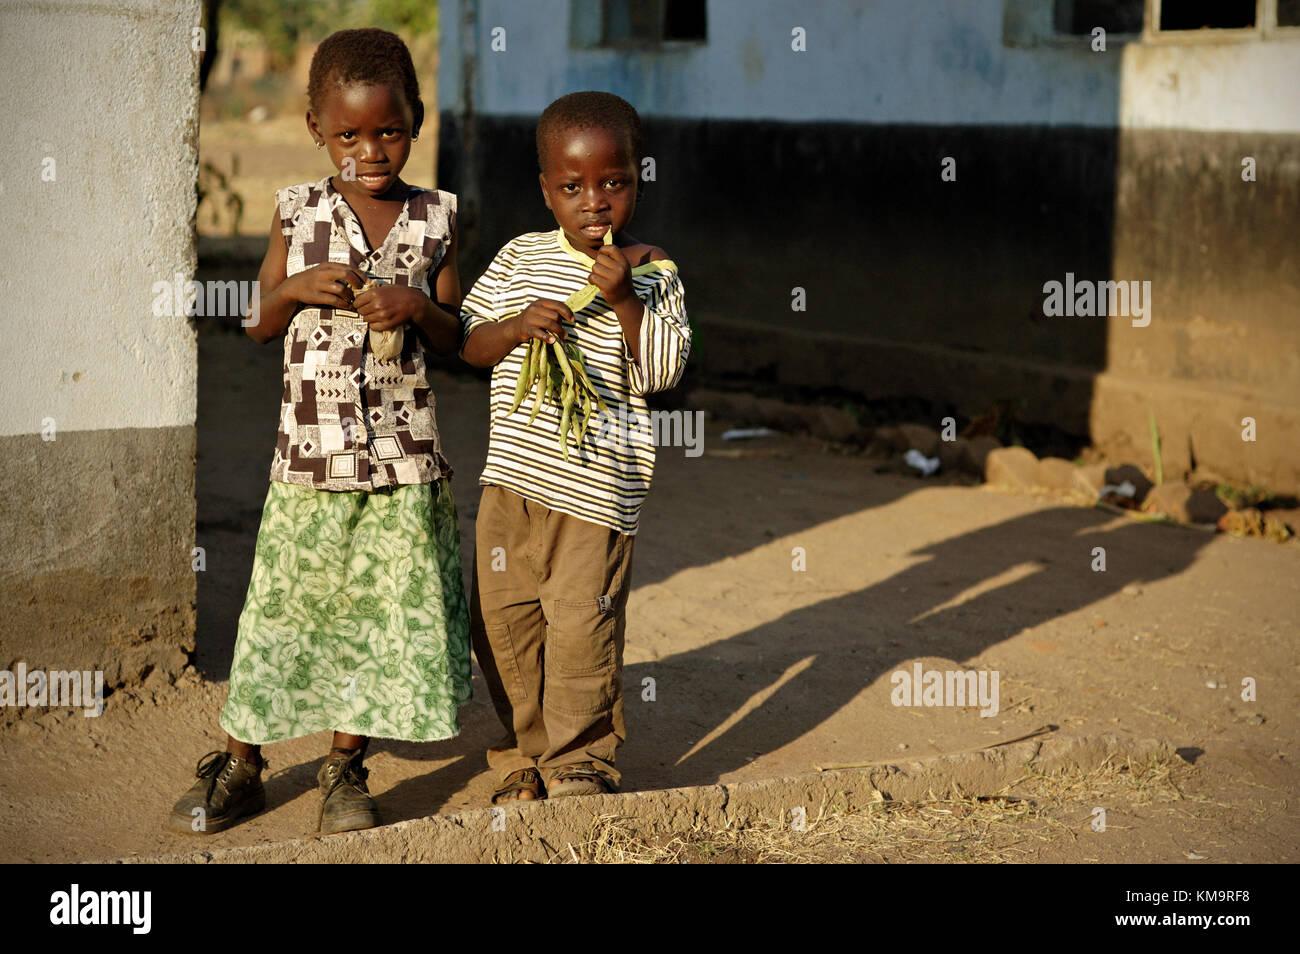 Two children in Kawaza village, Eastern Province, Zambia Stock Photo